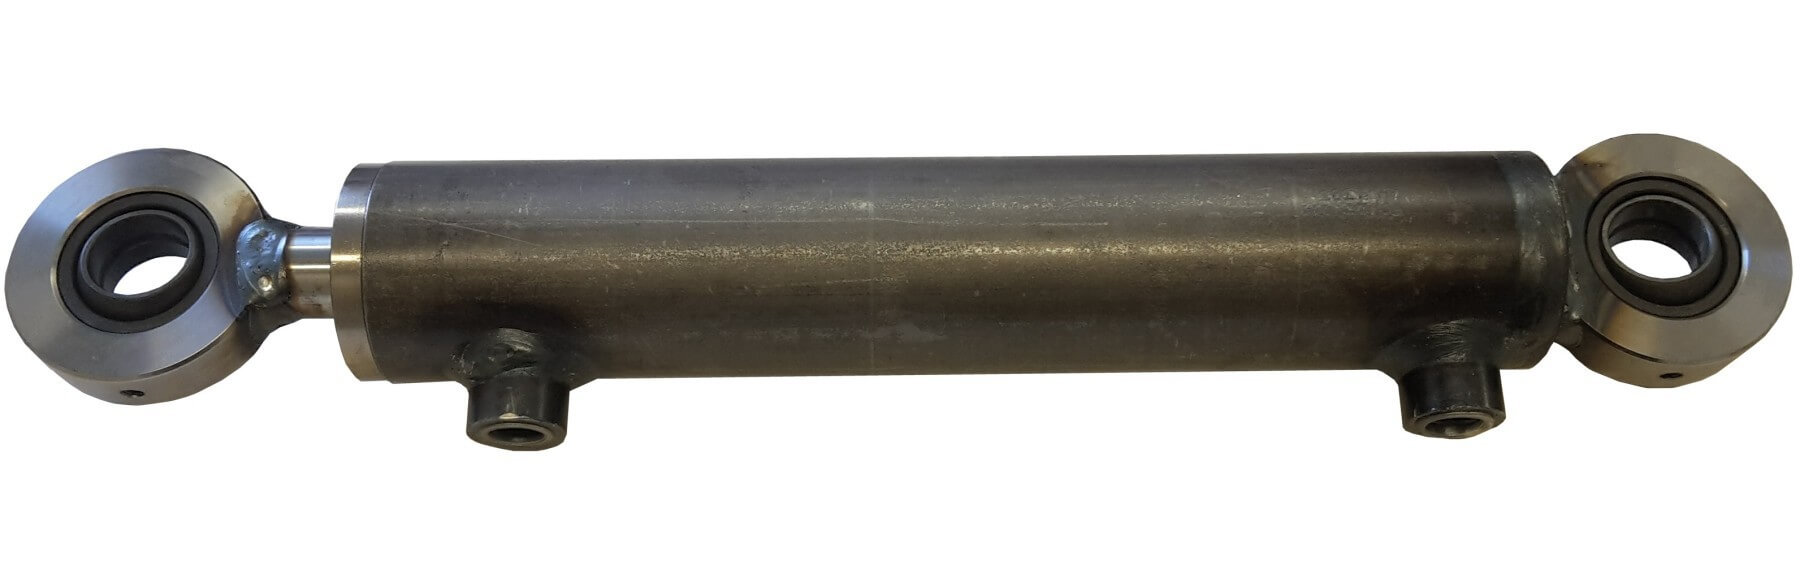 Hydraulisylinteri CL 32. 20. 400 GE